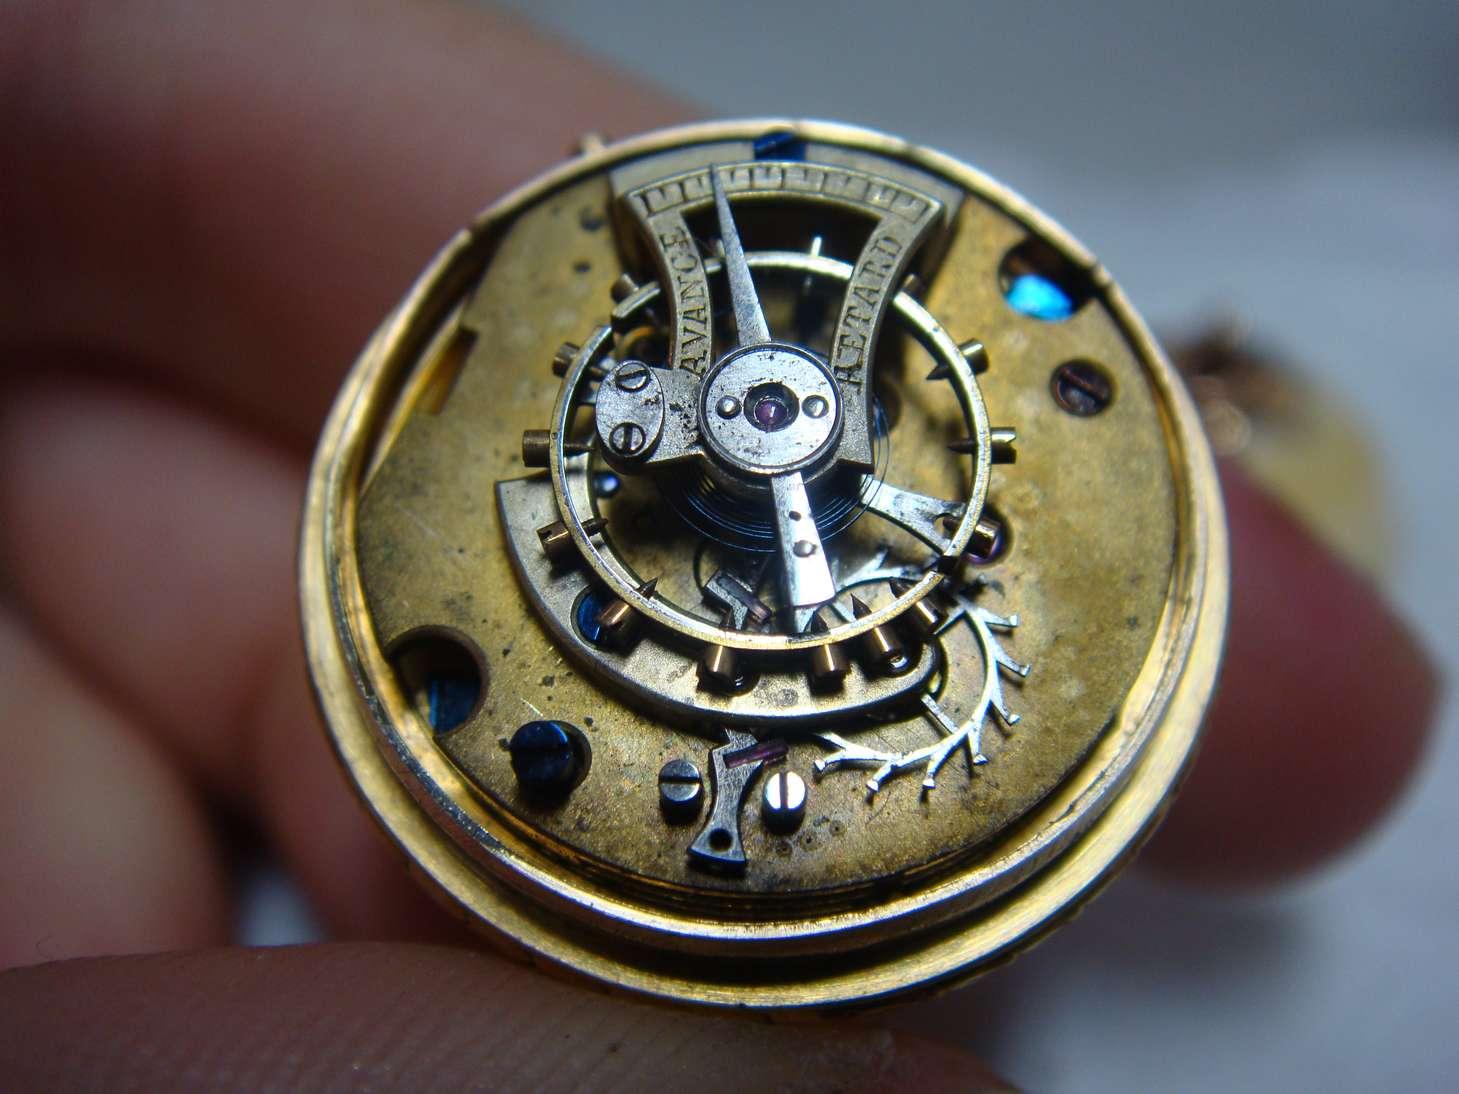 boule-geneve-montre-luxe-ivoire-horlogerie-cabinotier-art-restauration-restaurarte-mecanisme-reparation.jpg